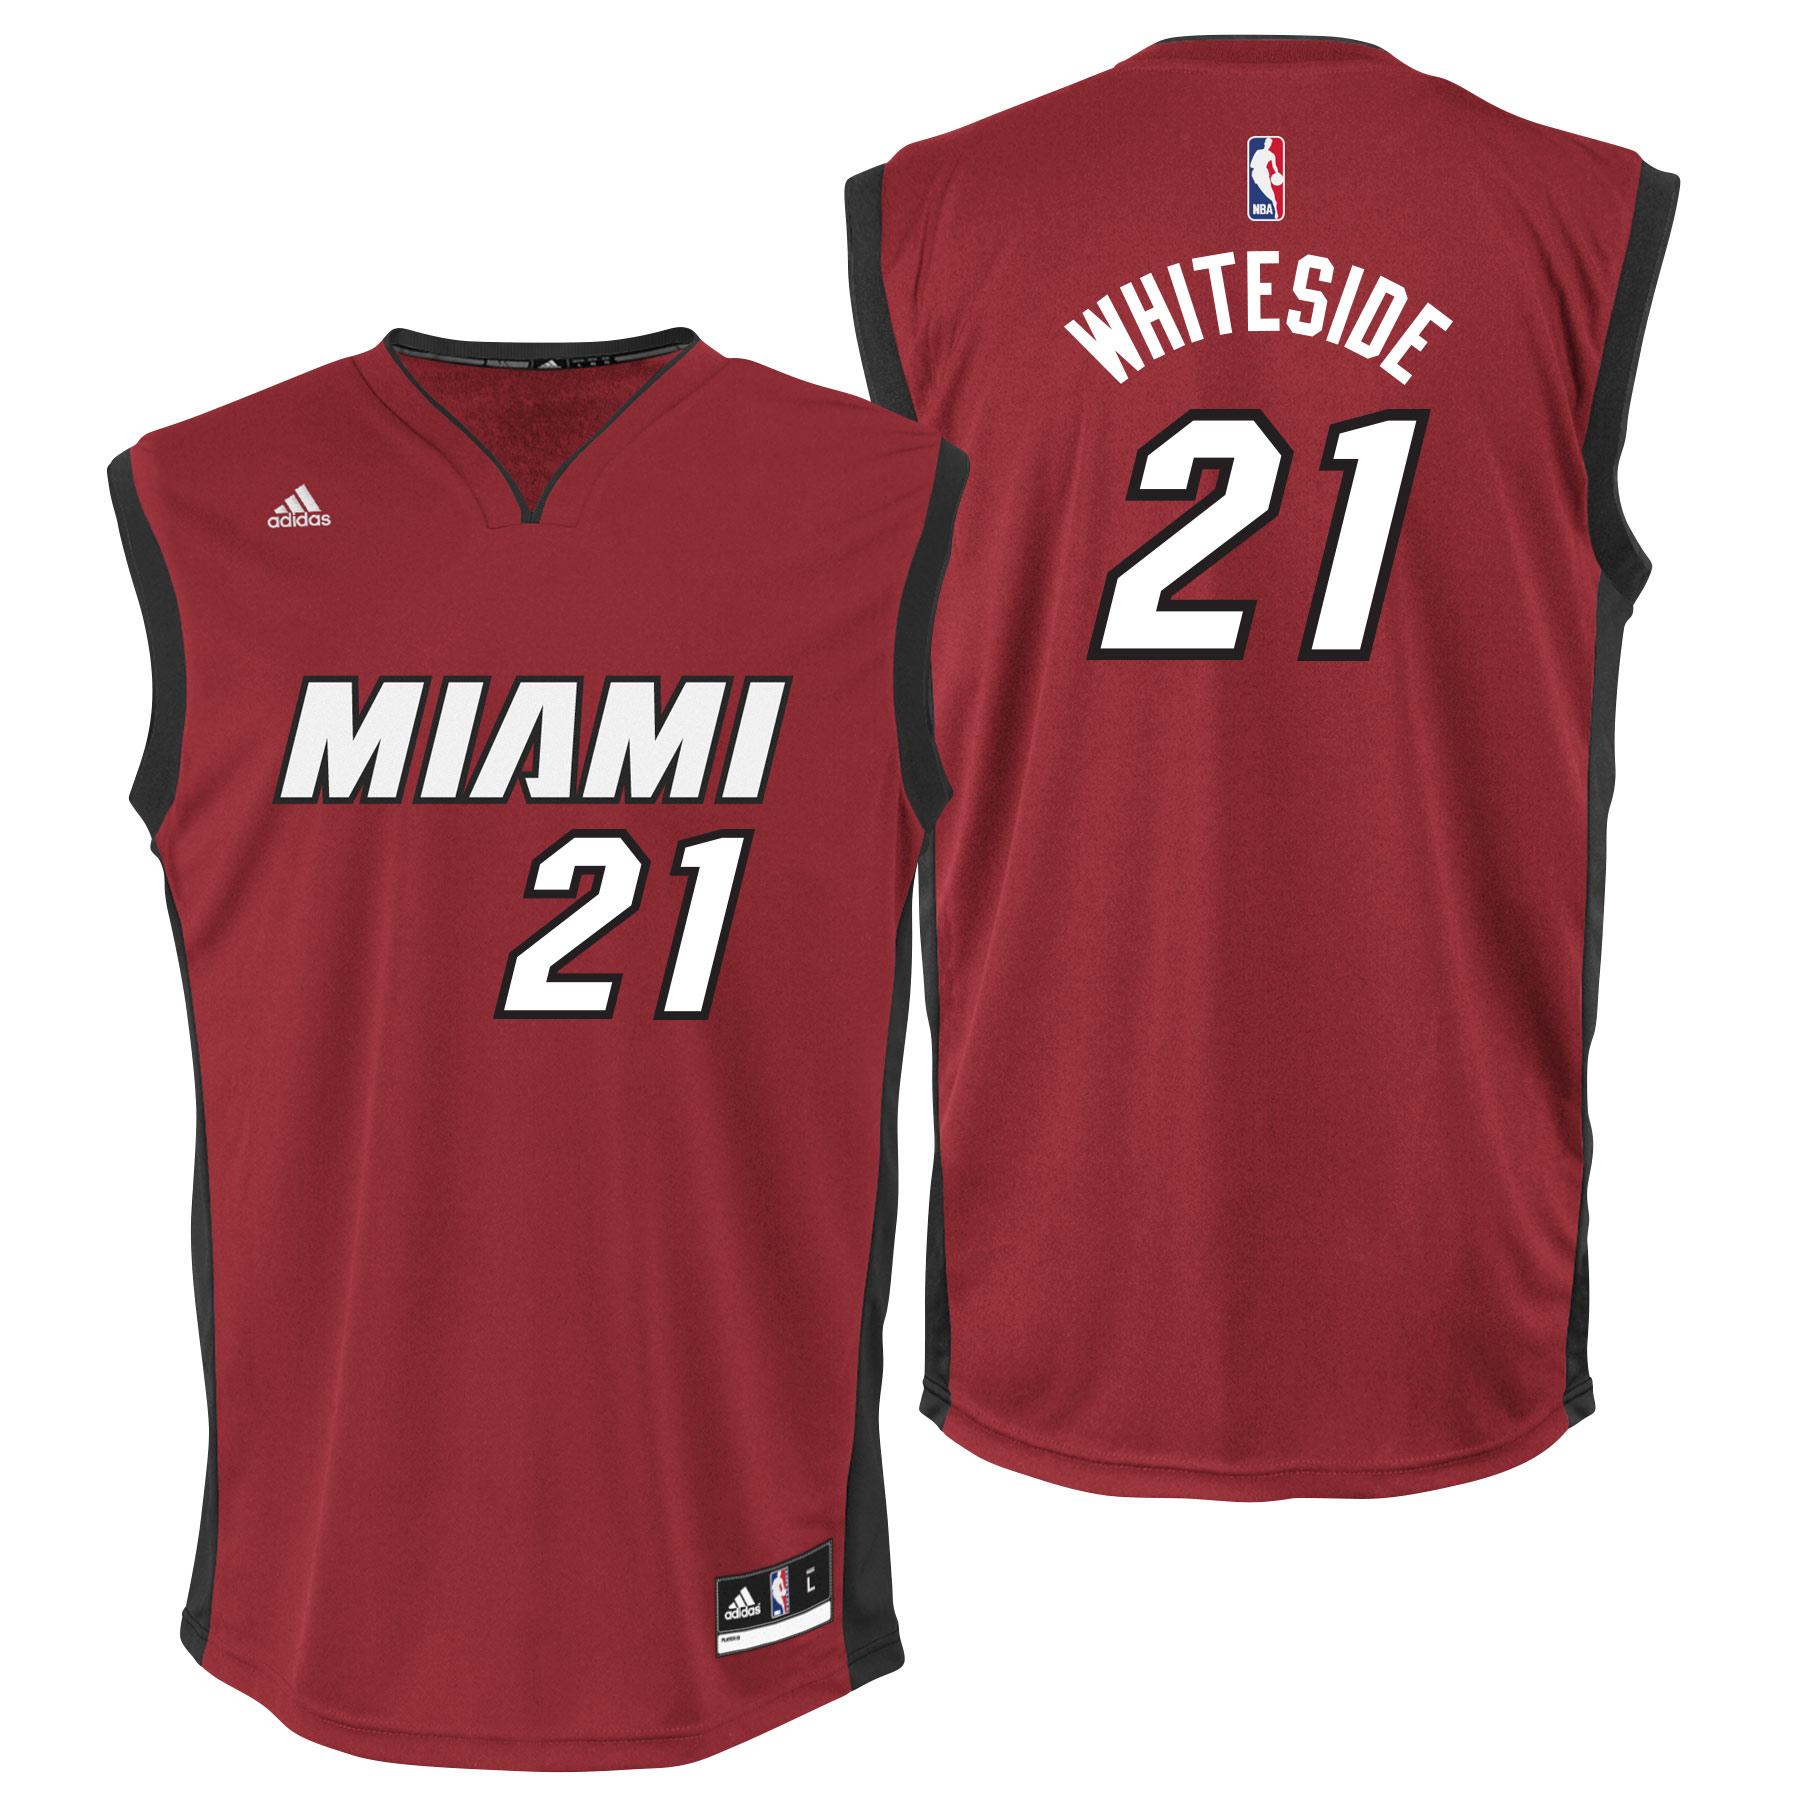 Miami Heat Alternate Replica Jersey - Hassan Whiteside - Mens